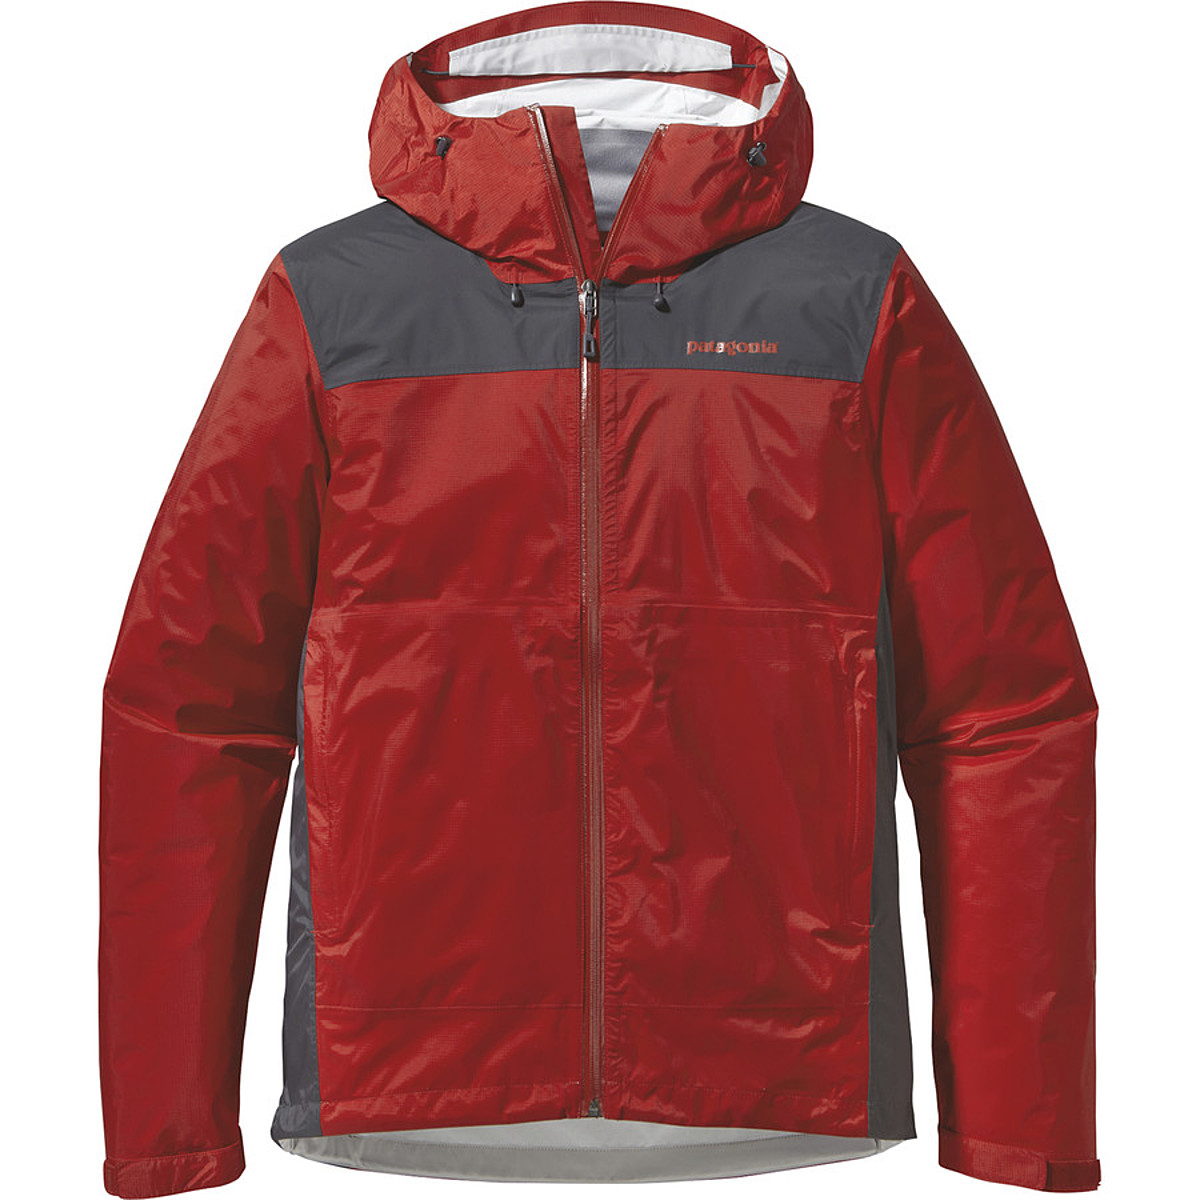 Patagonia Torrentshell Plus Jacket